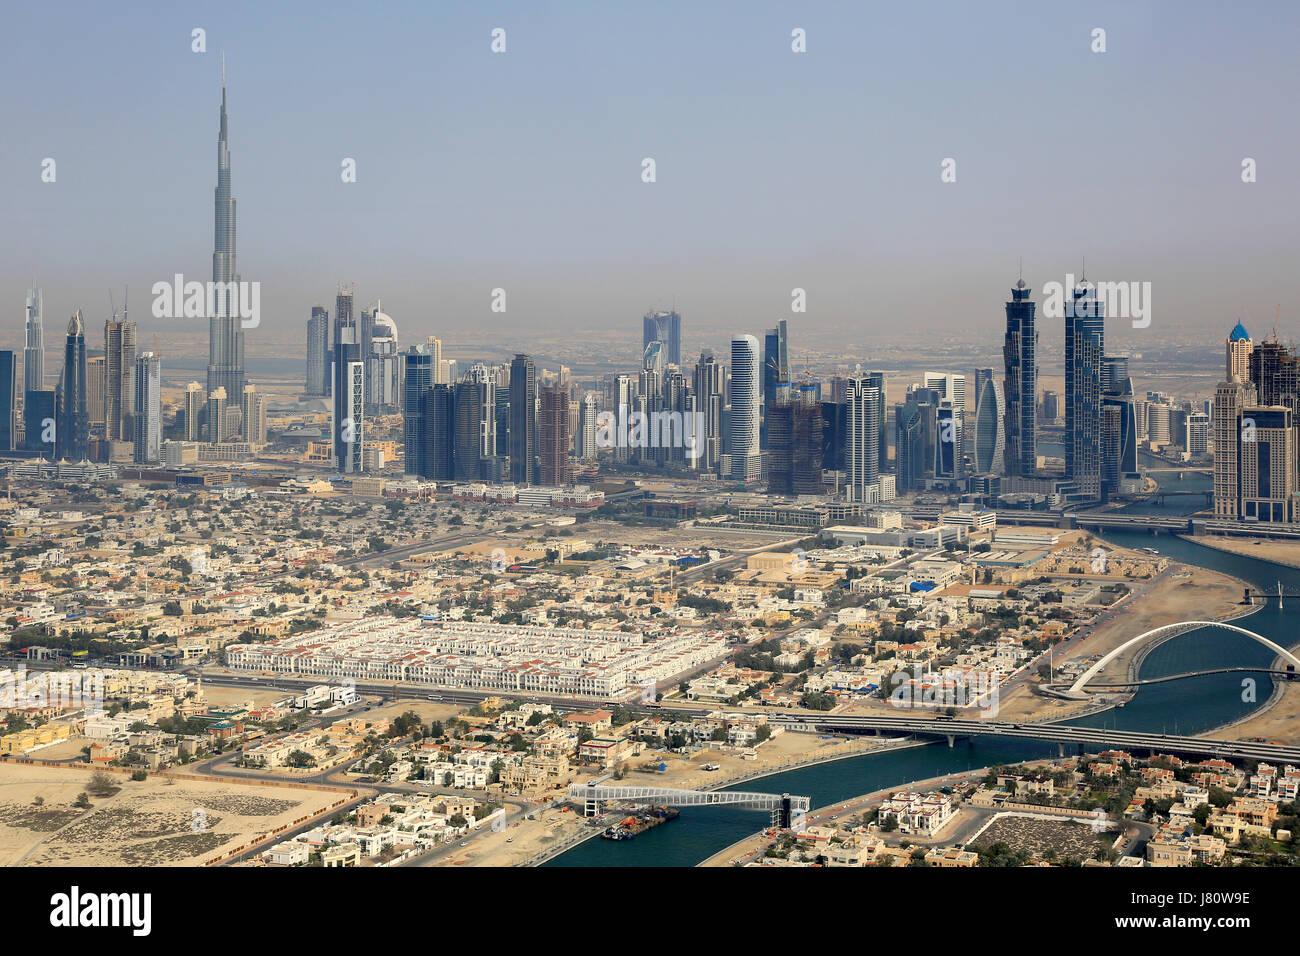 Dubai Downtown buildings with Burj Khalifa aerial view photography UAE - Stock Image